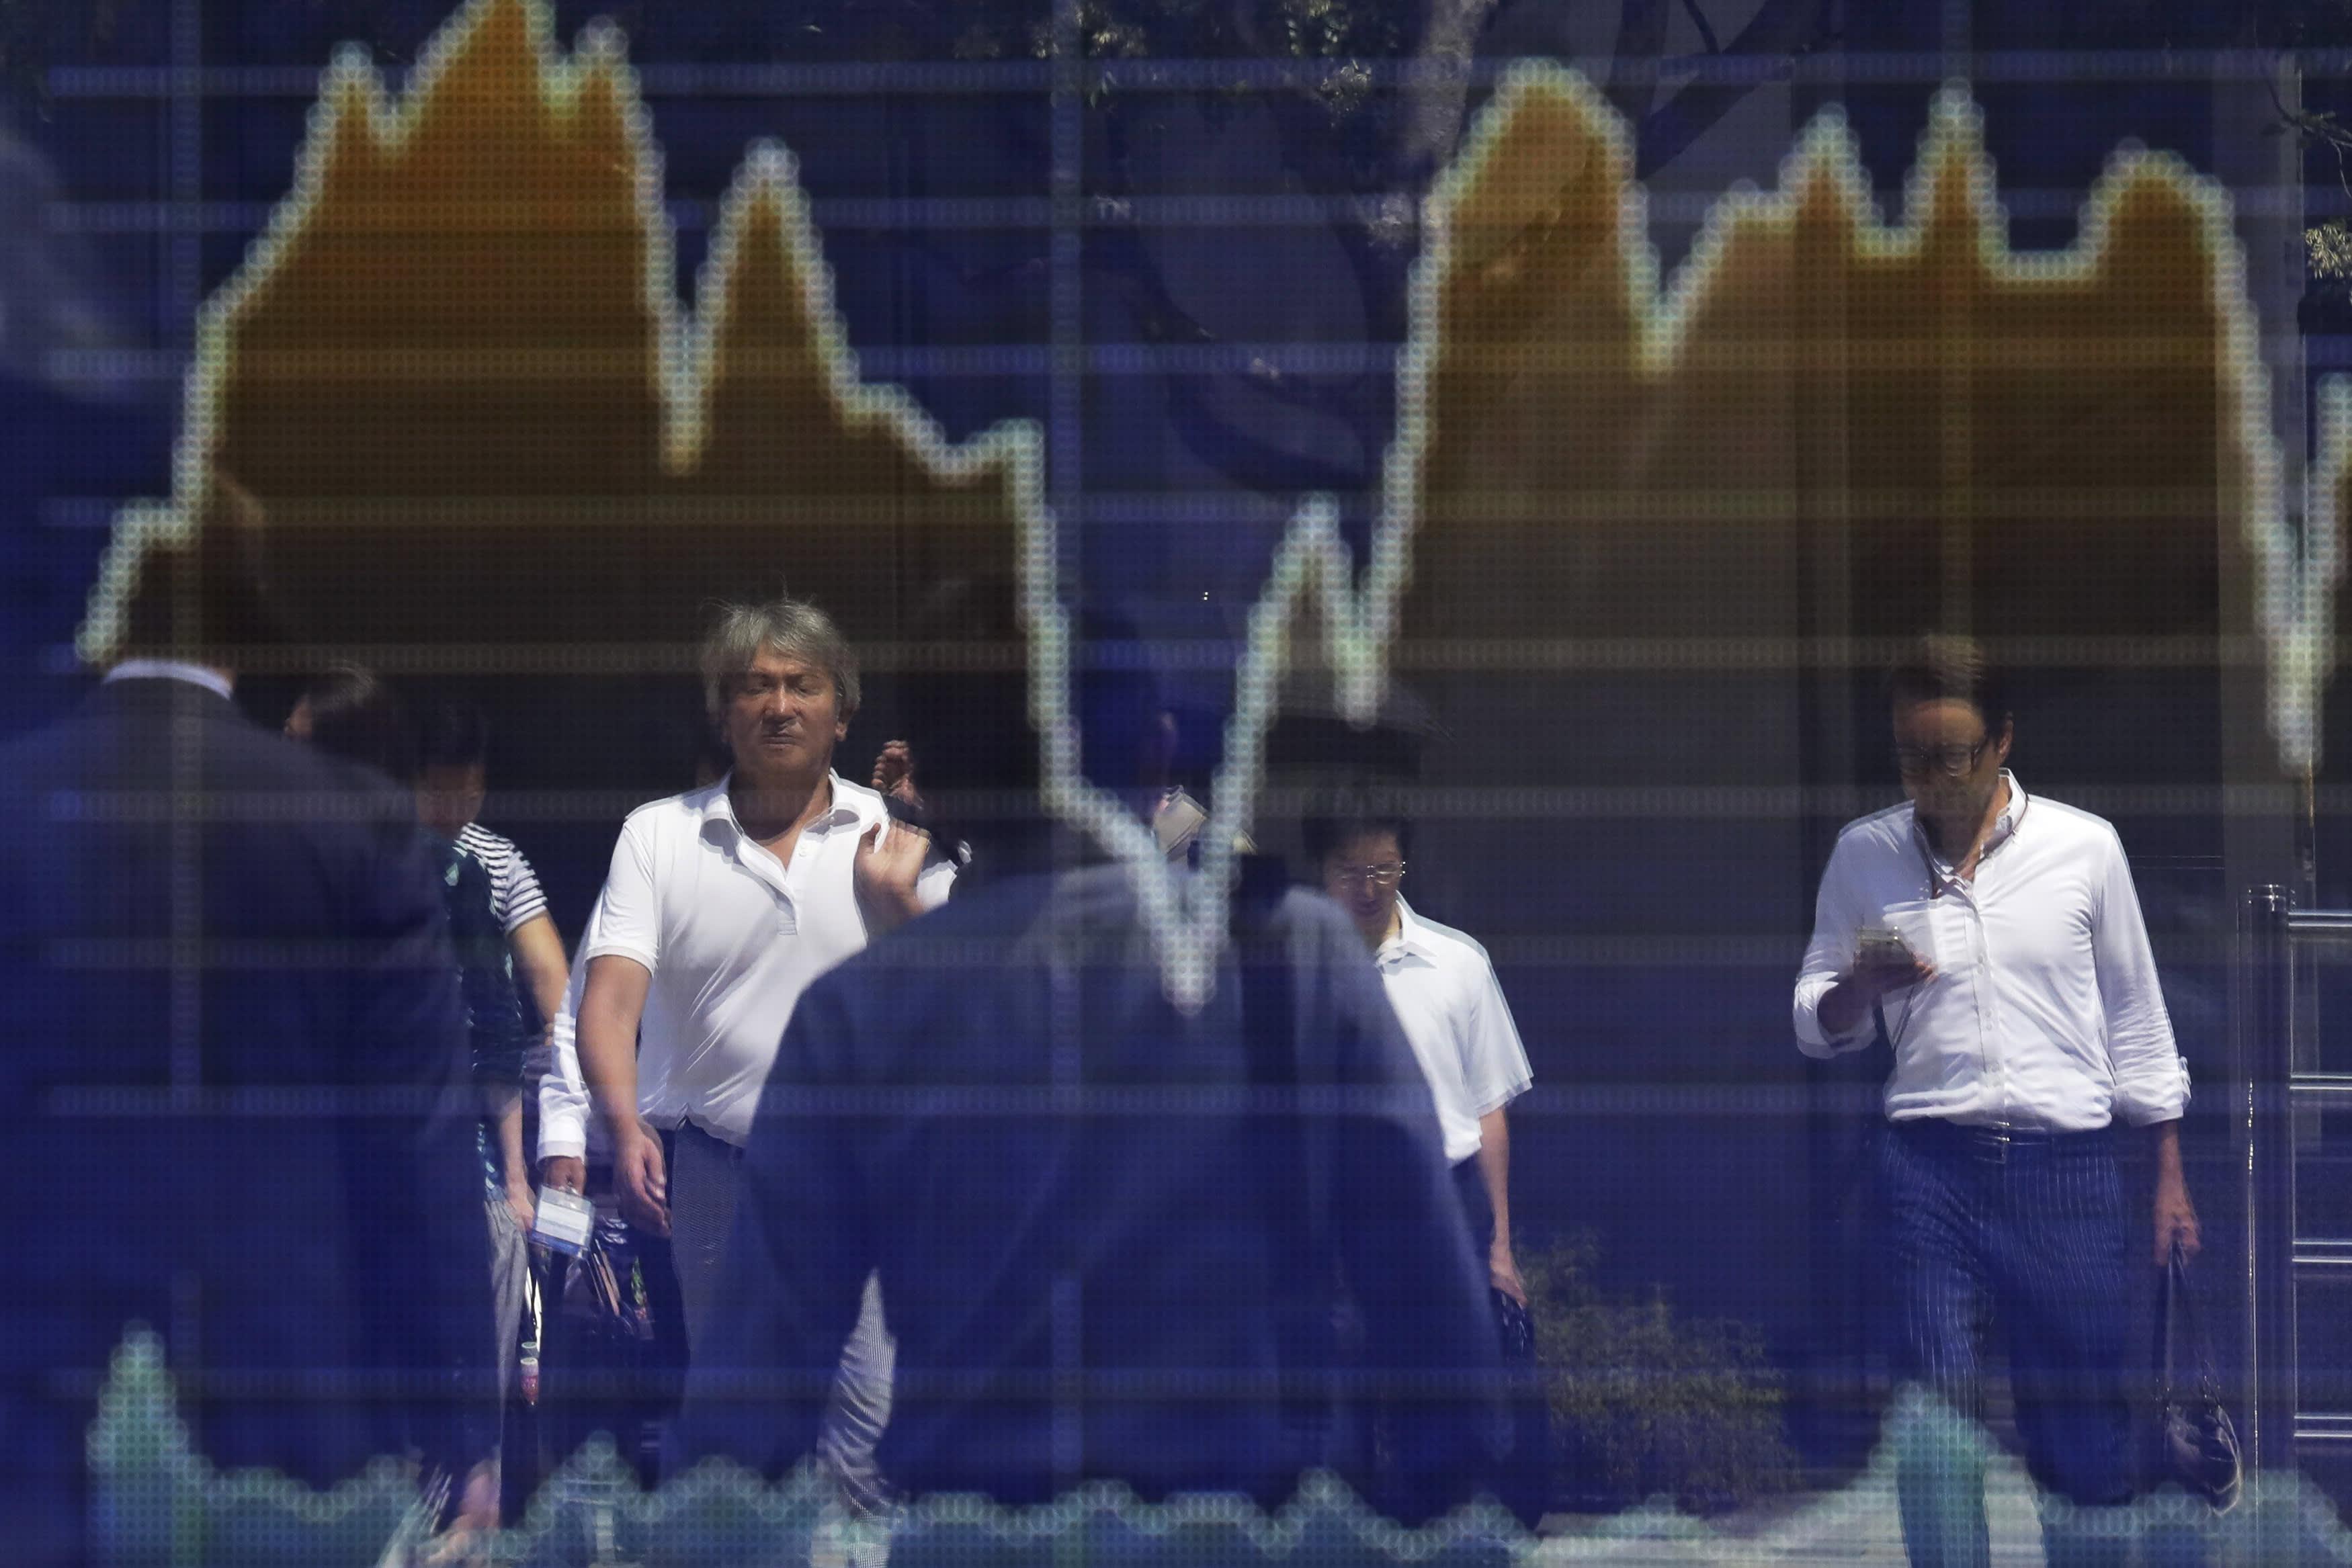 Asian markets decline as trade worries weigh on investor sentiment